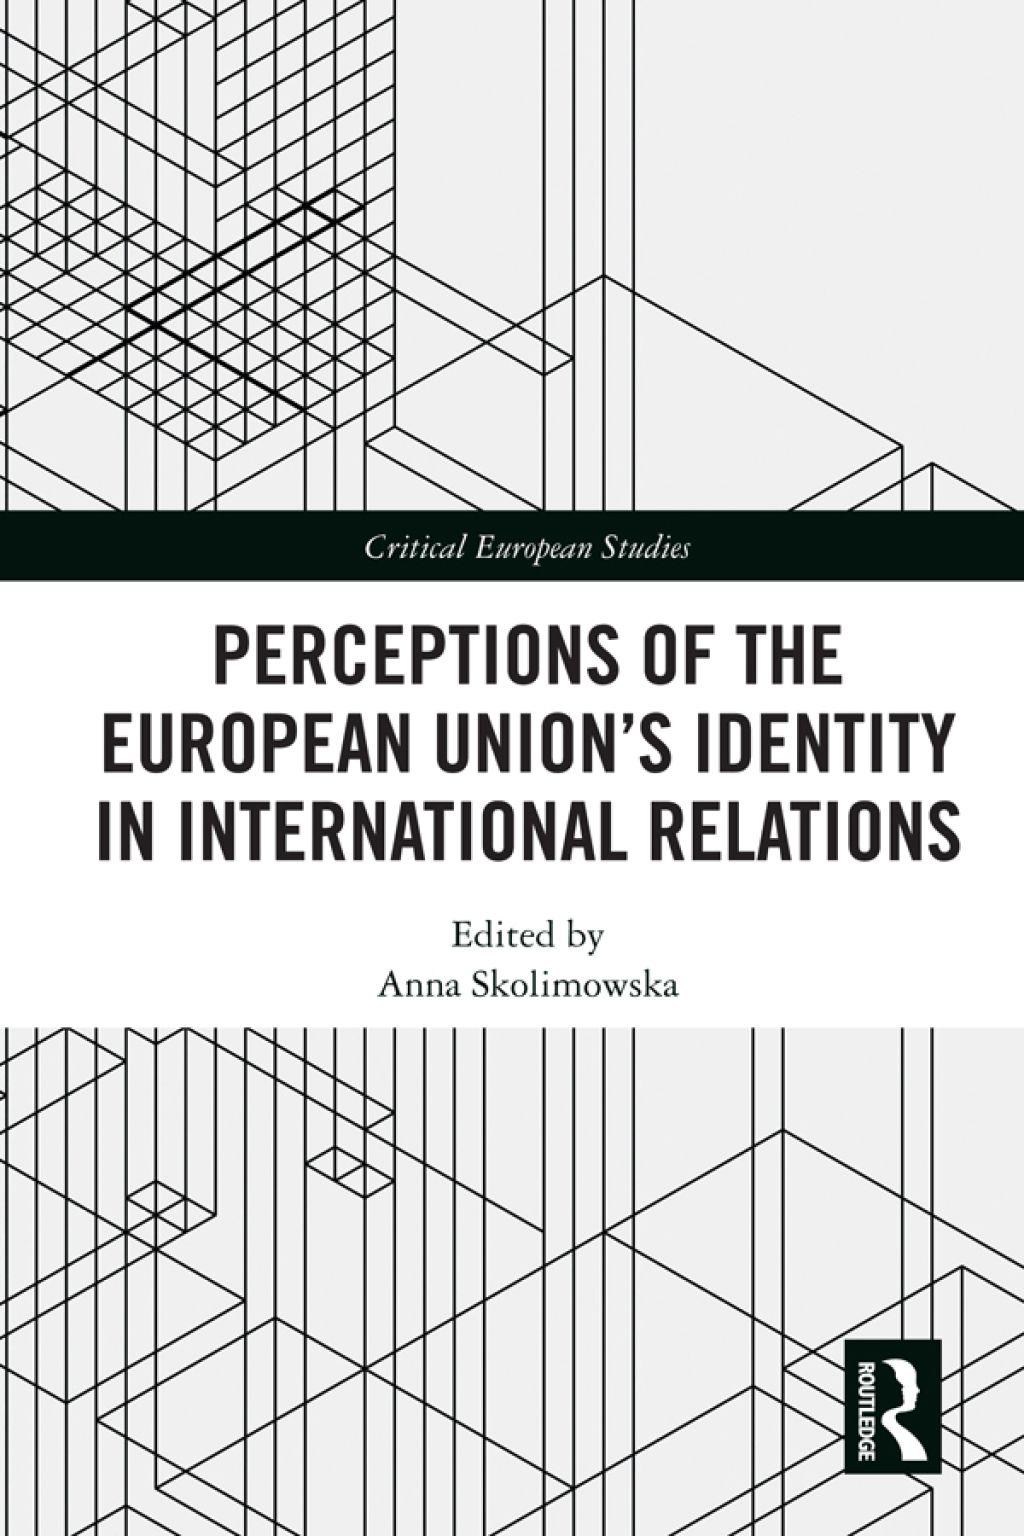 Perceptions of the European Union's Identity in International